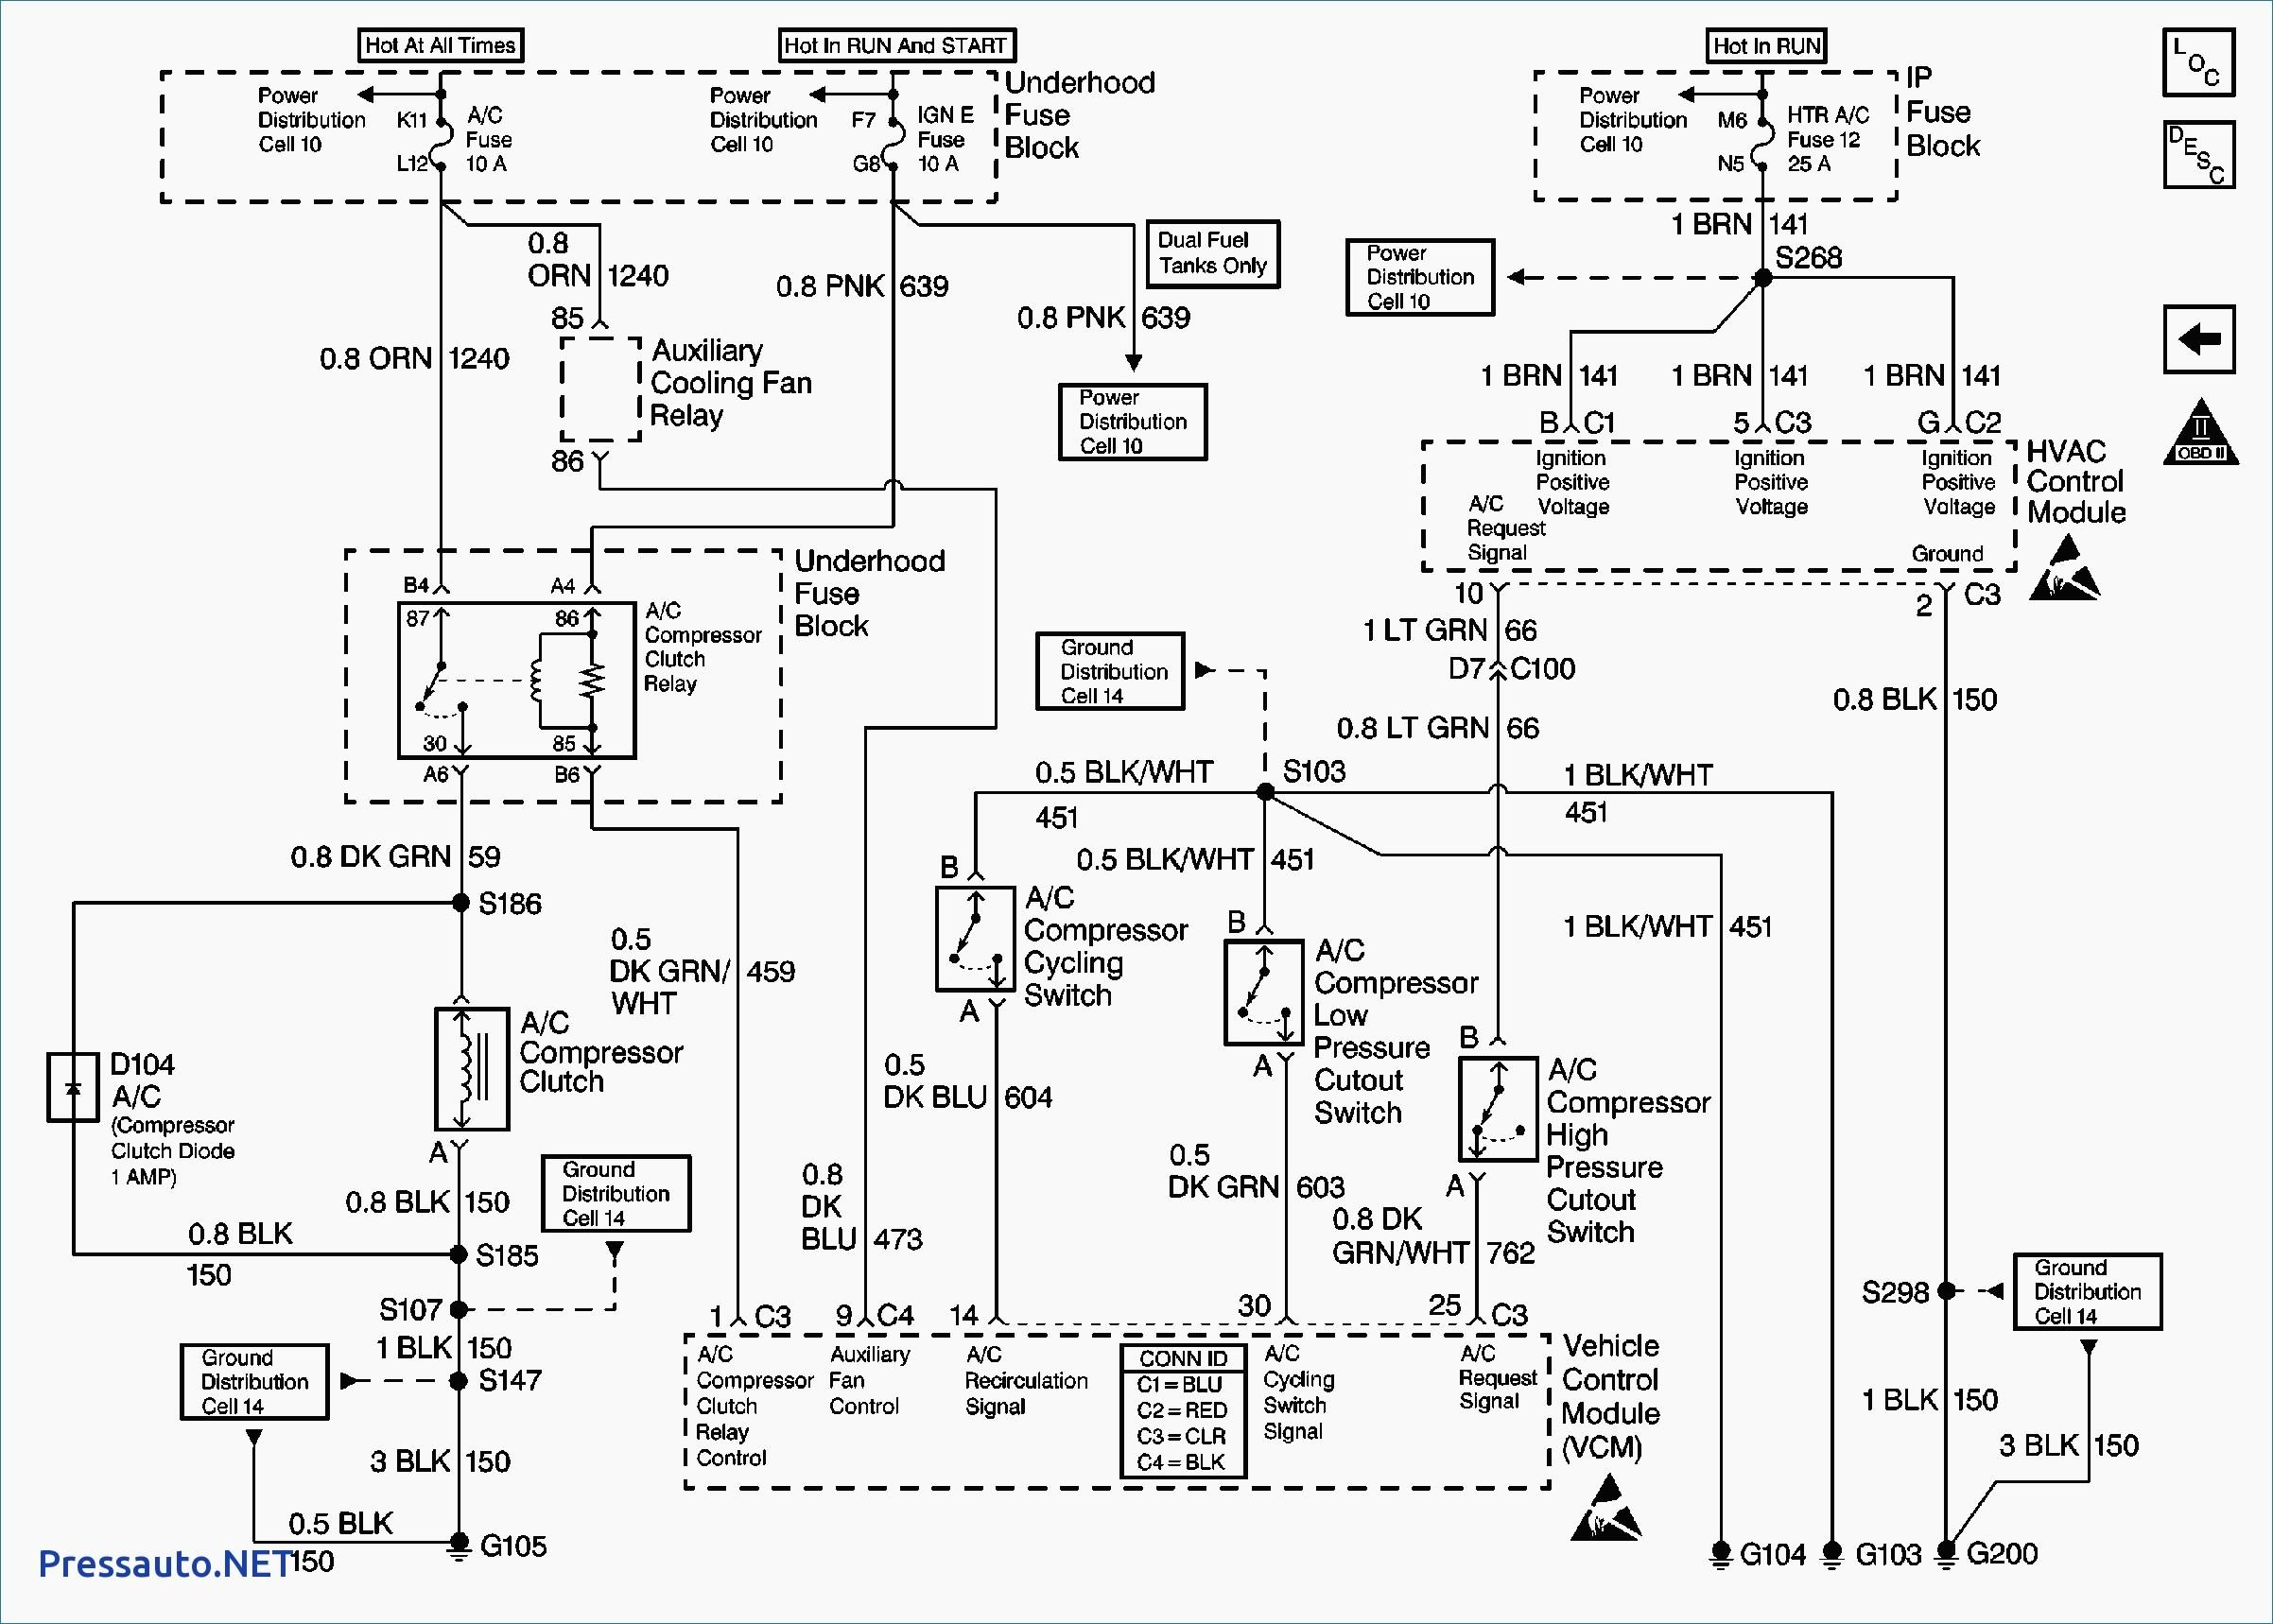 Remarkable Celect Plus Wiring Diagram Volvo Wiring Diagram Wiring Cloud Ostrrenstrafr09Org